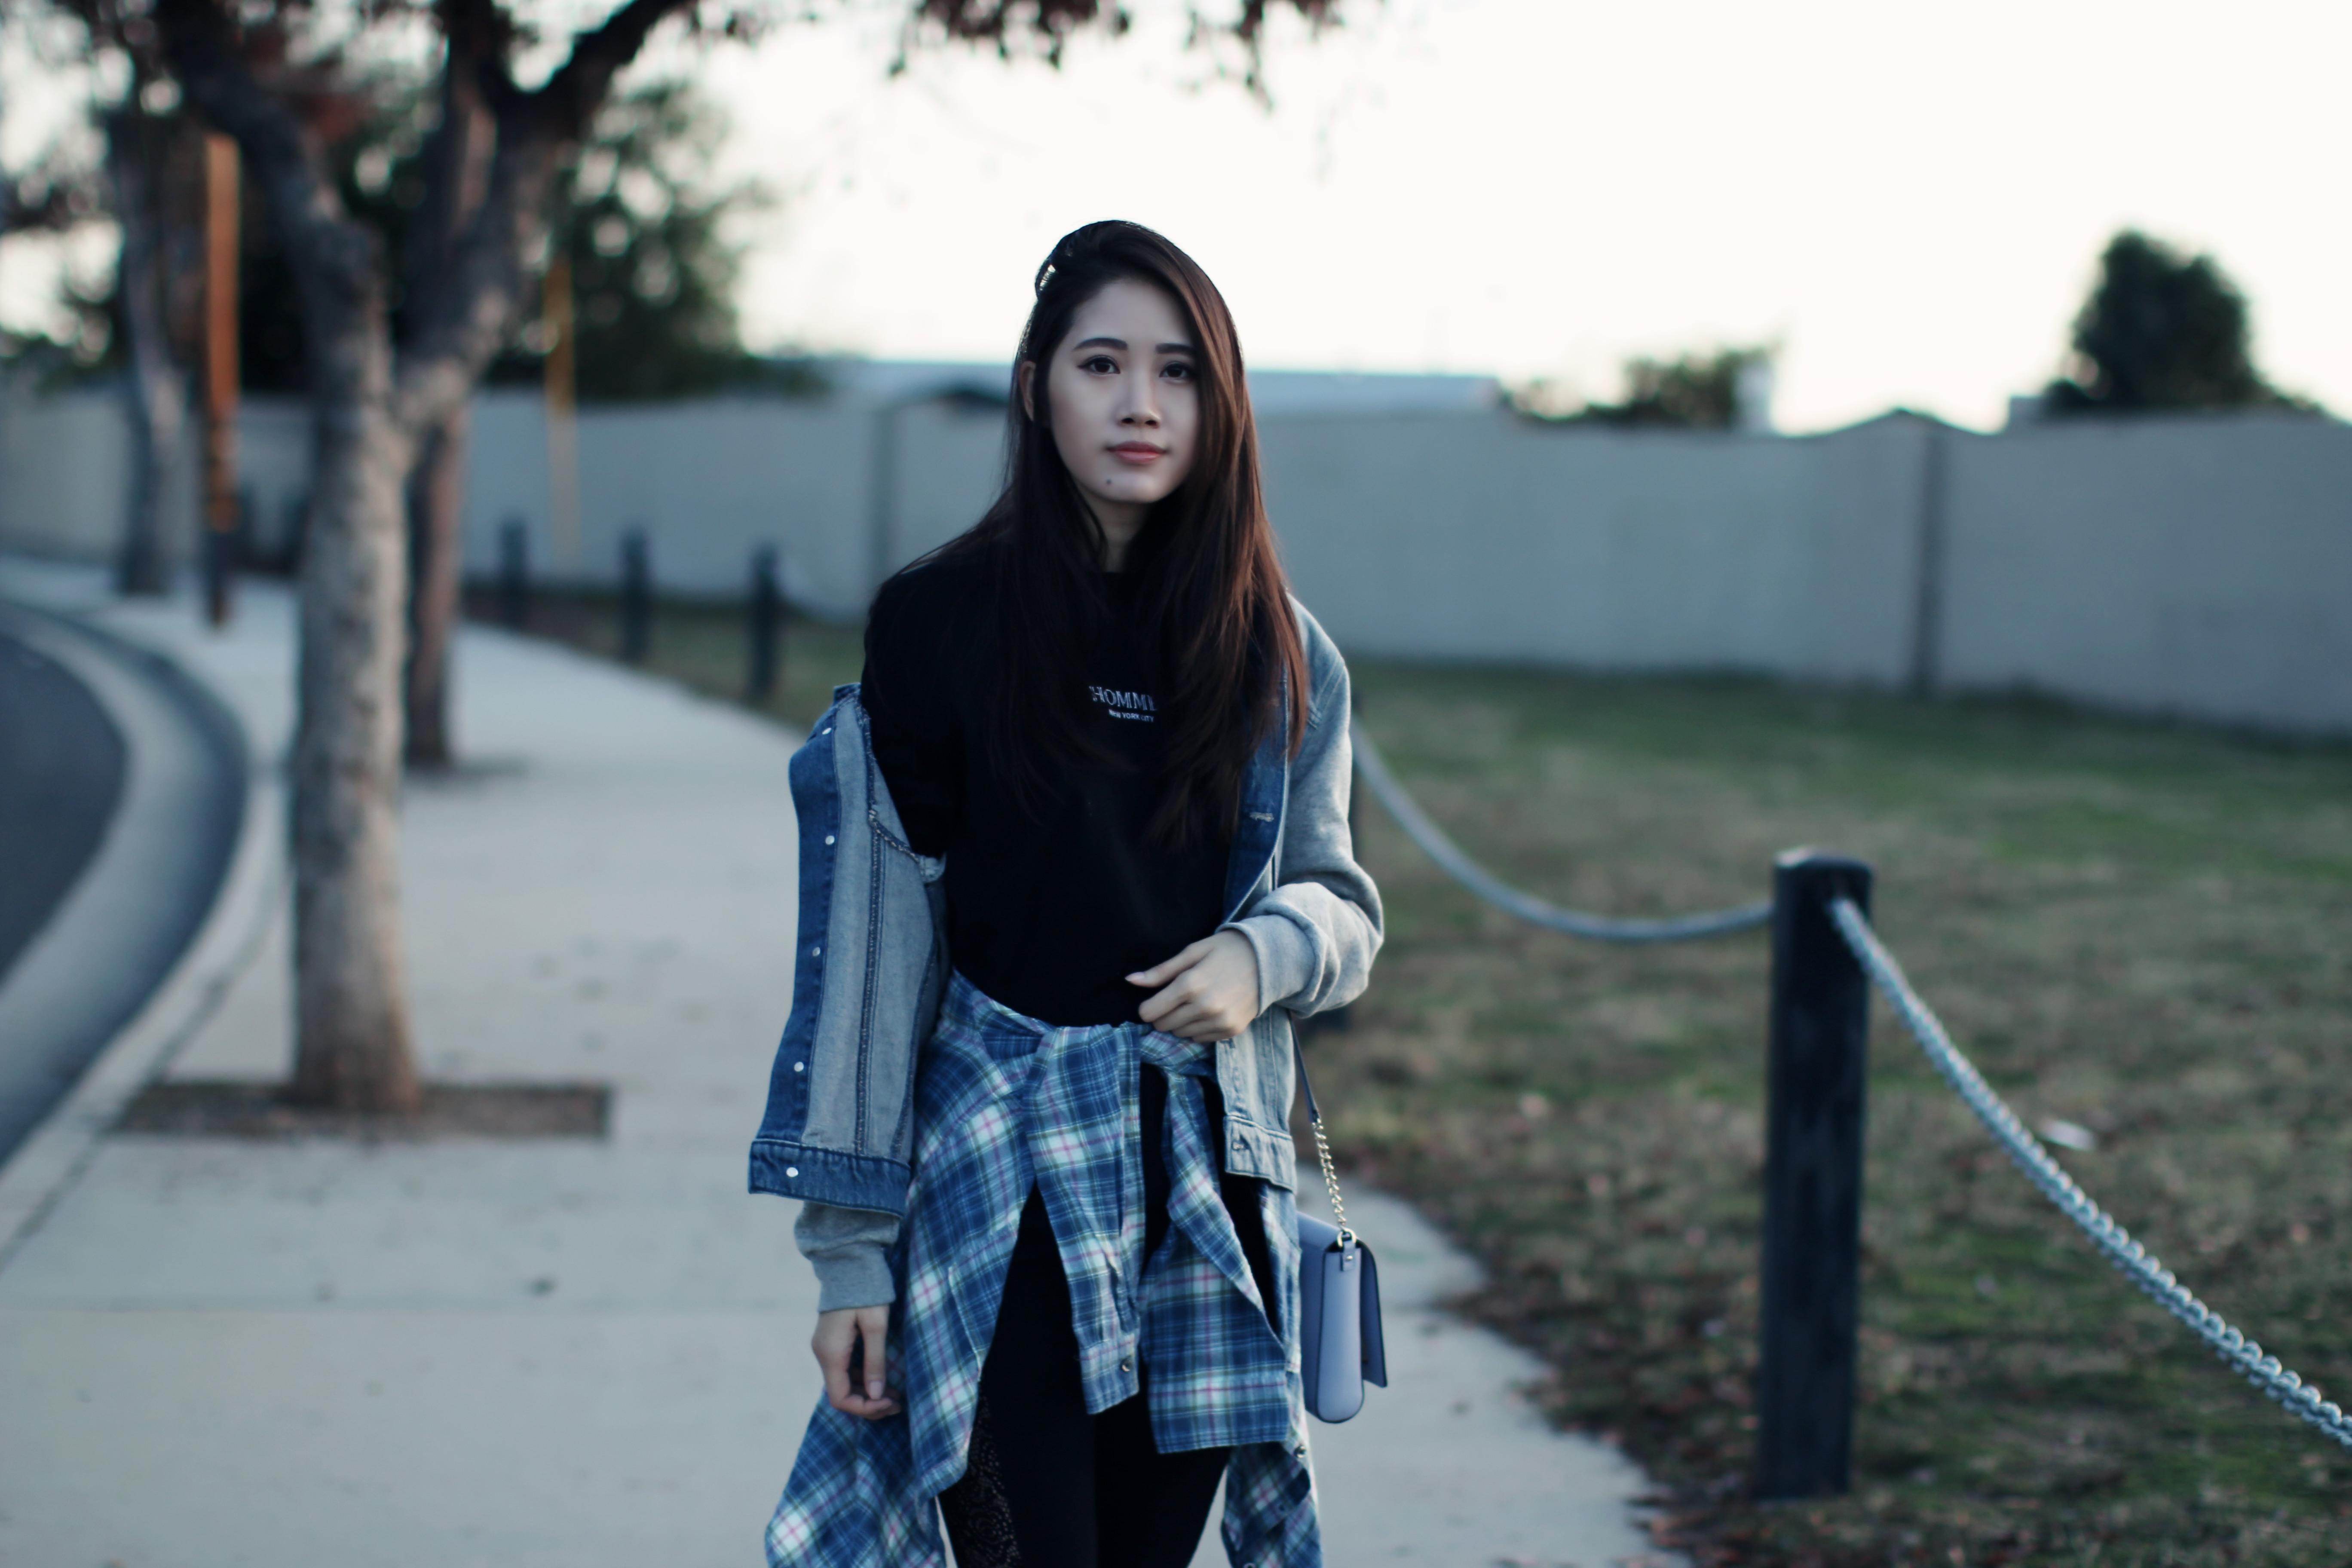 4334-ootd-fashion-style-outfitoftheday-wiwt-streetstyle-urbanoutfitters-hm-f21xme-nike-elizabeeetht-clothestoyouuu